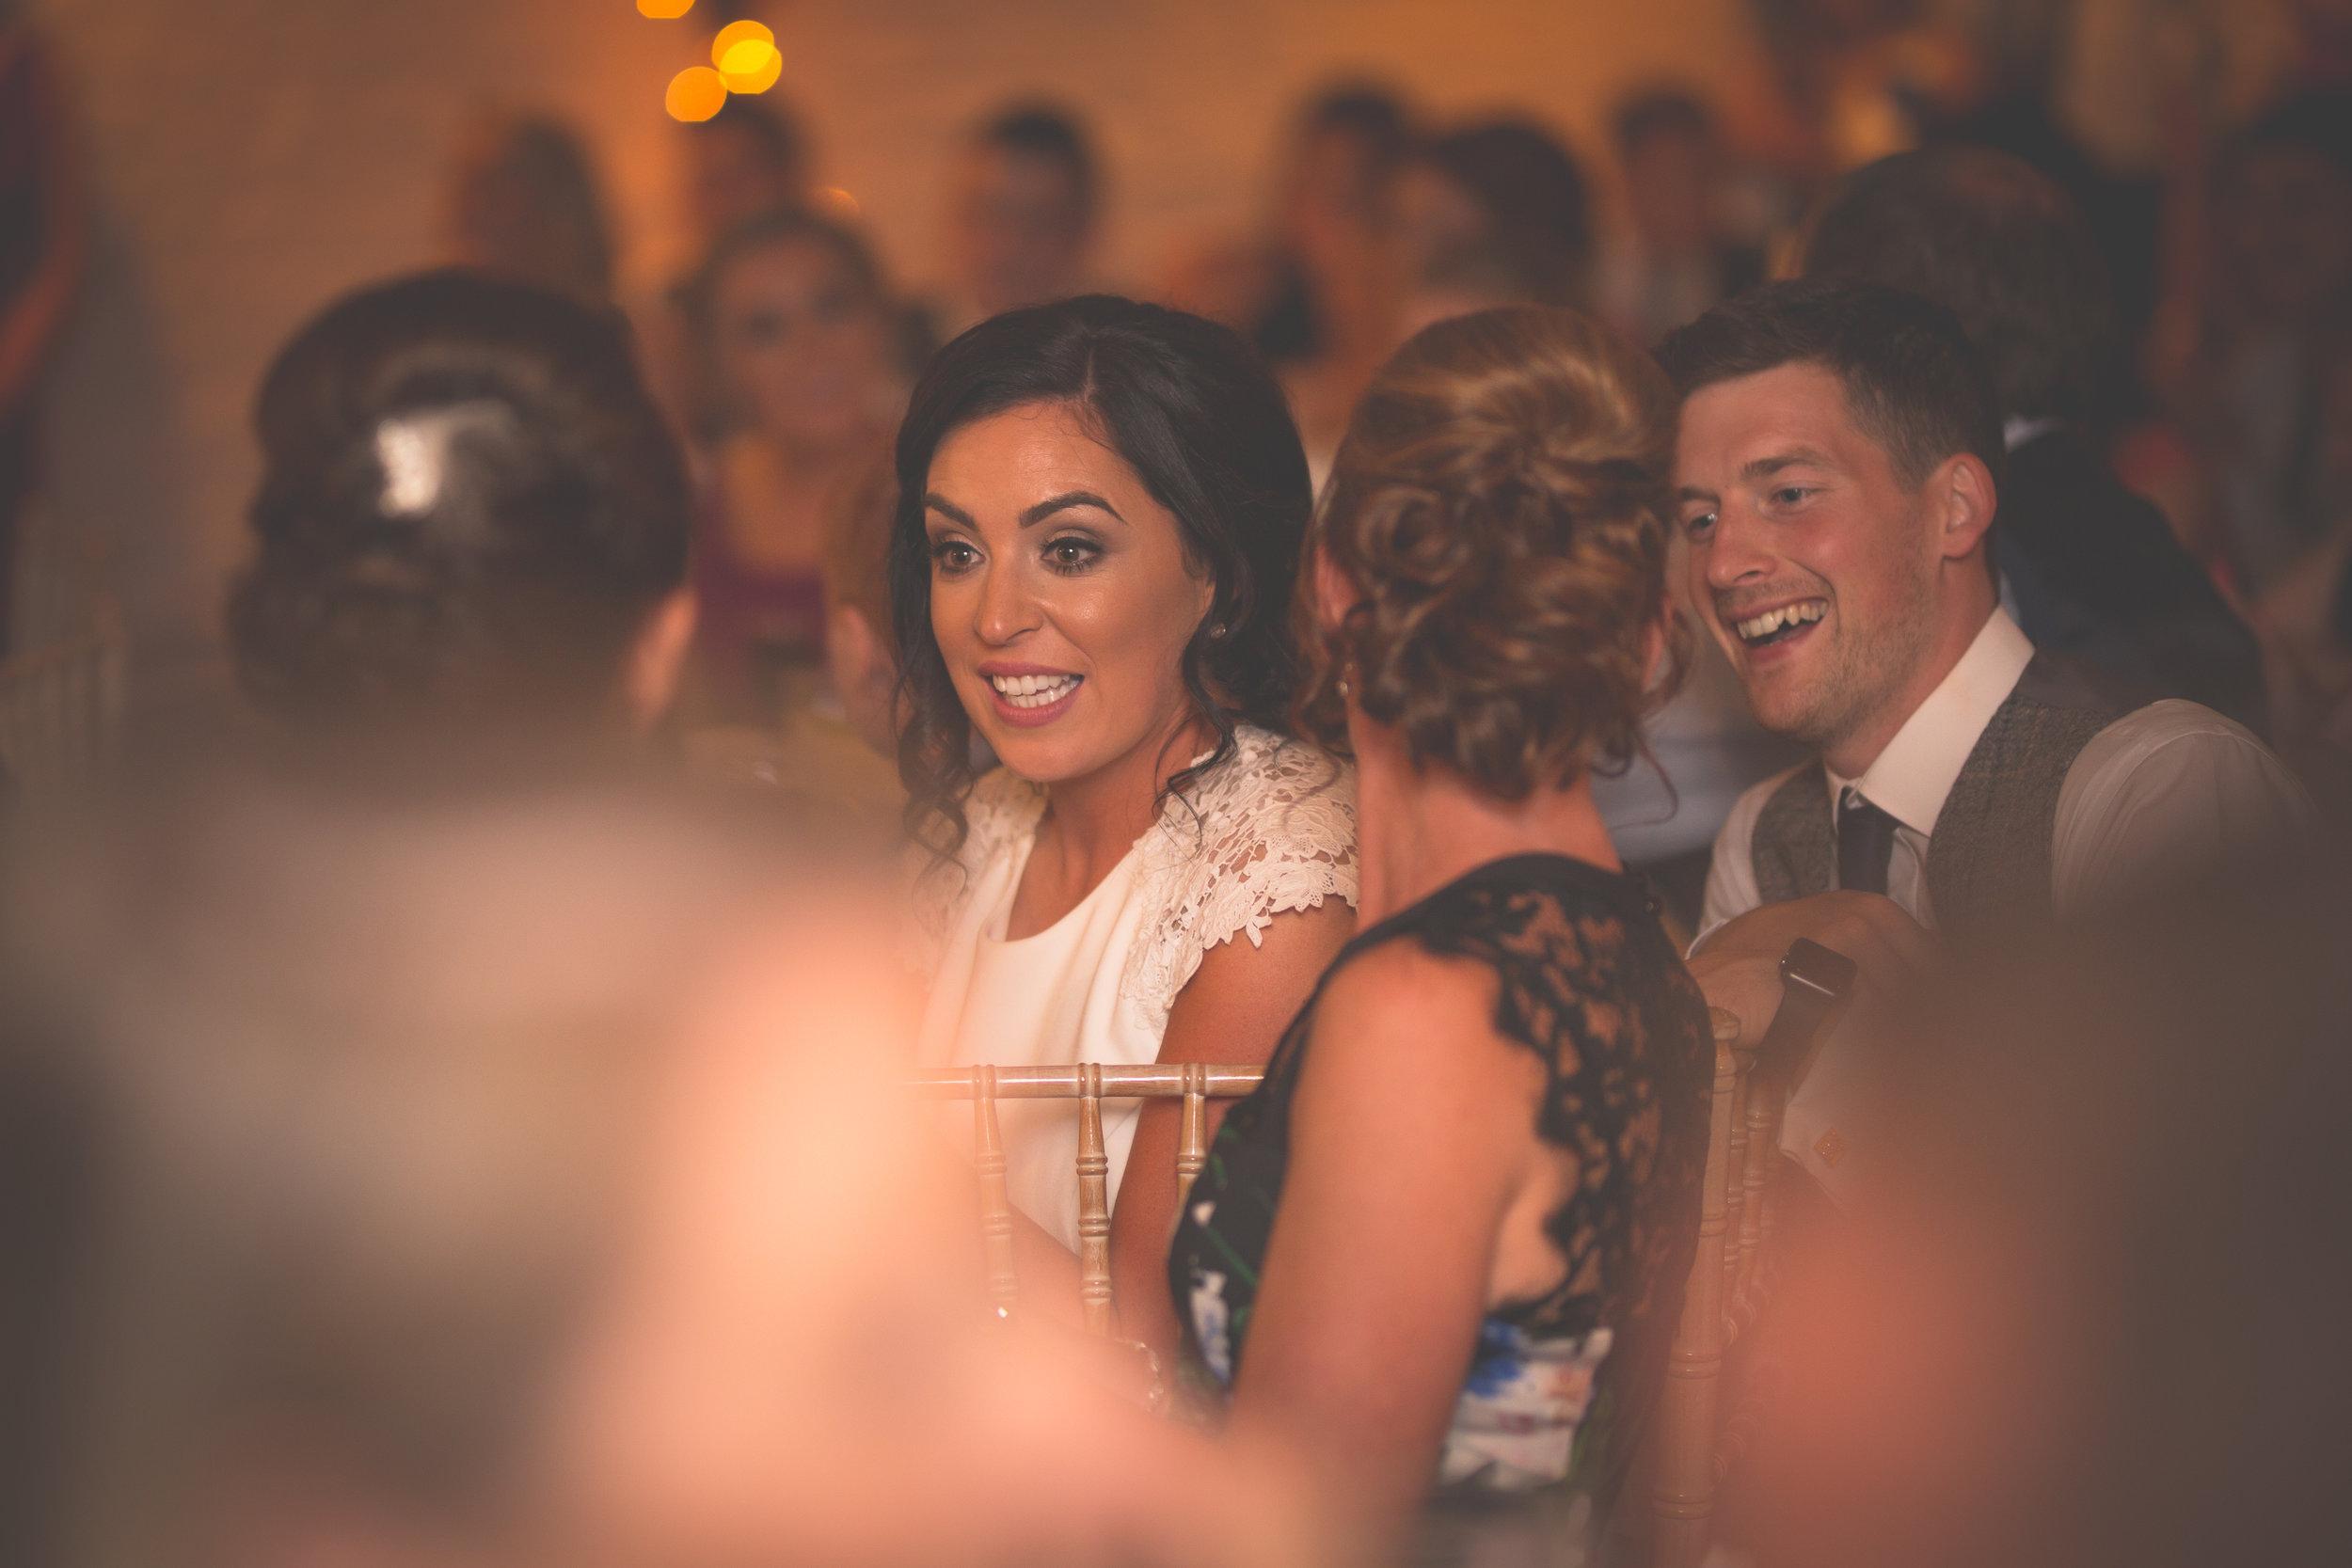 Brian McEwan Wedding Photography | Carol-Annee & Sean | The Dancing-5.jpg